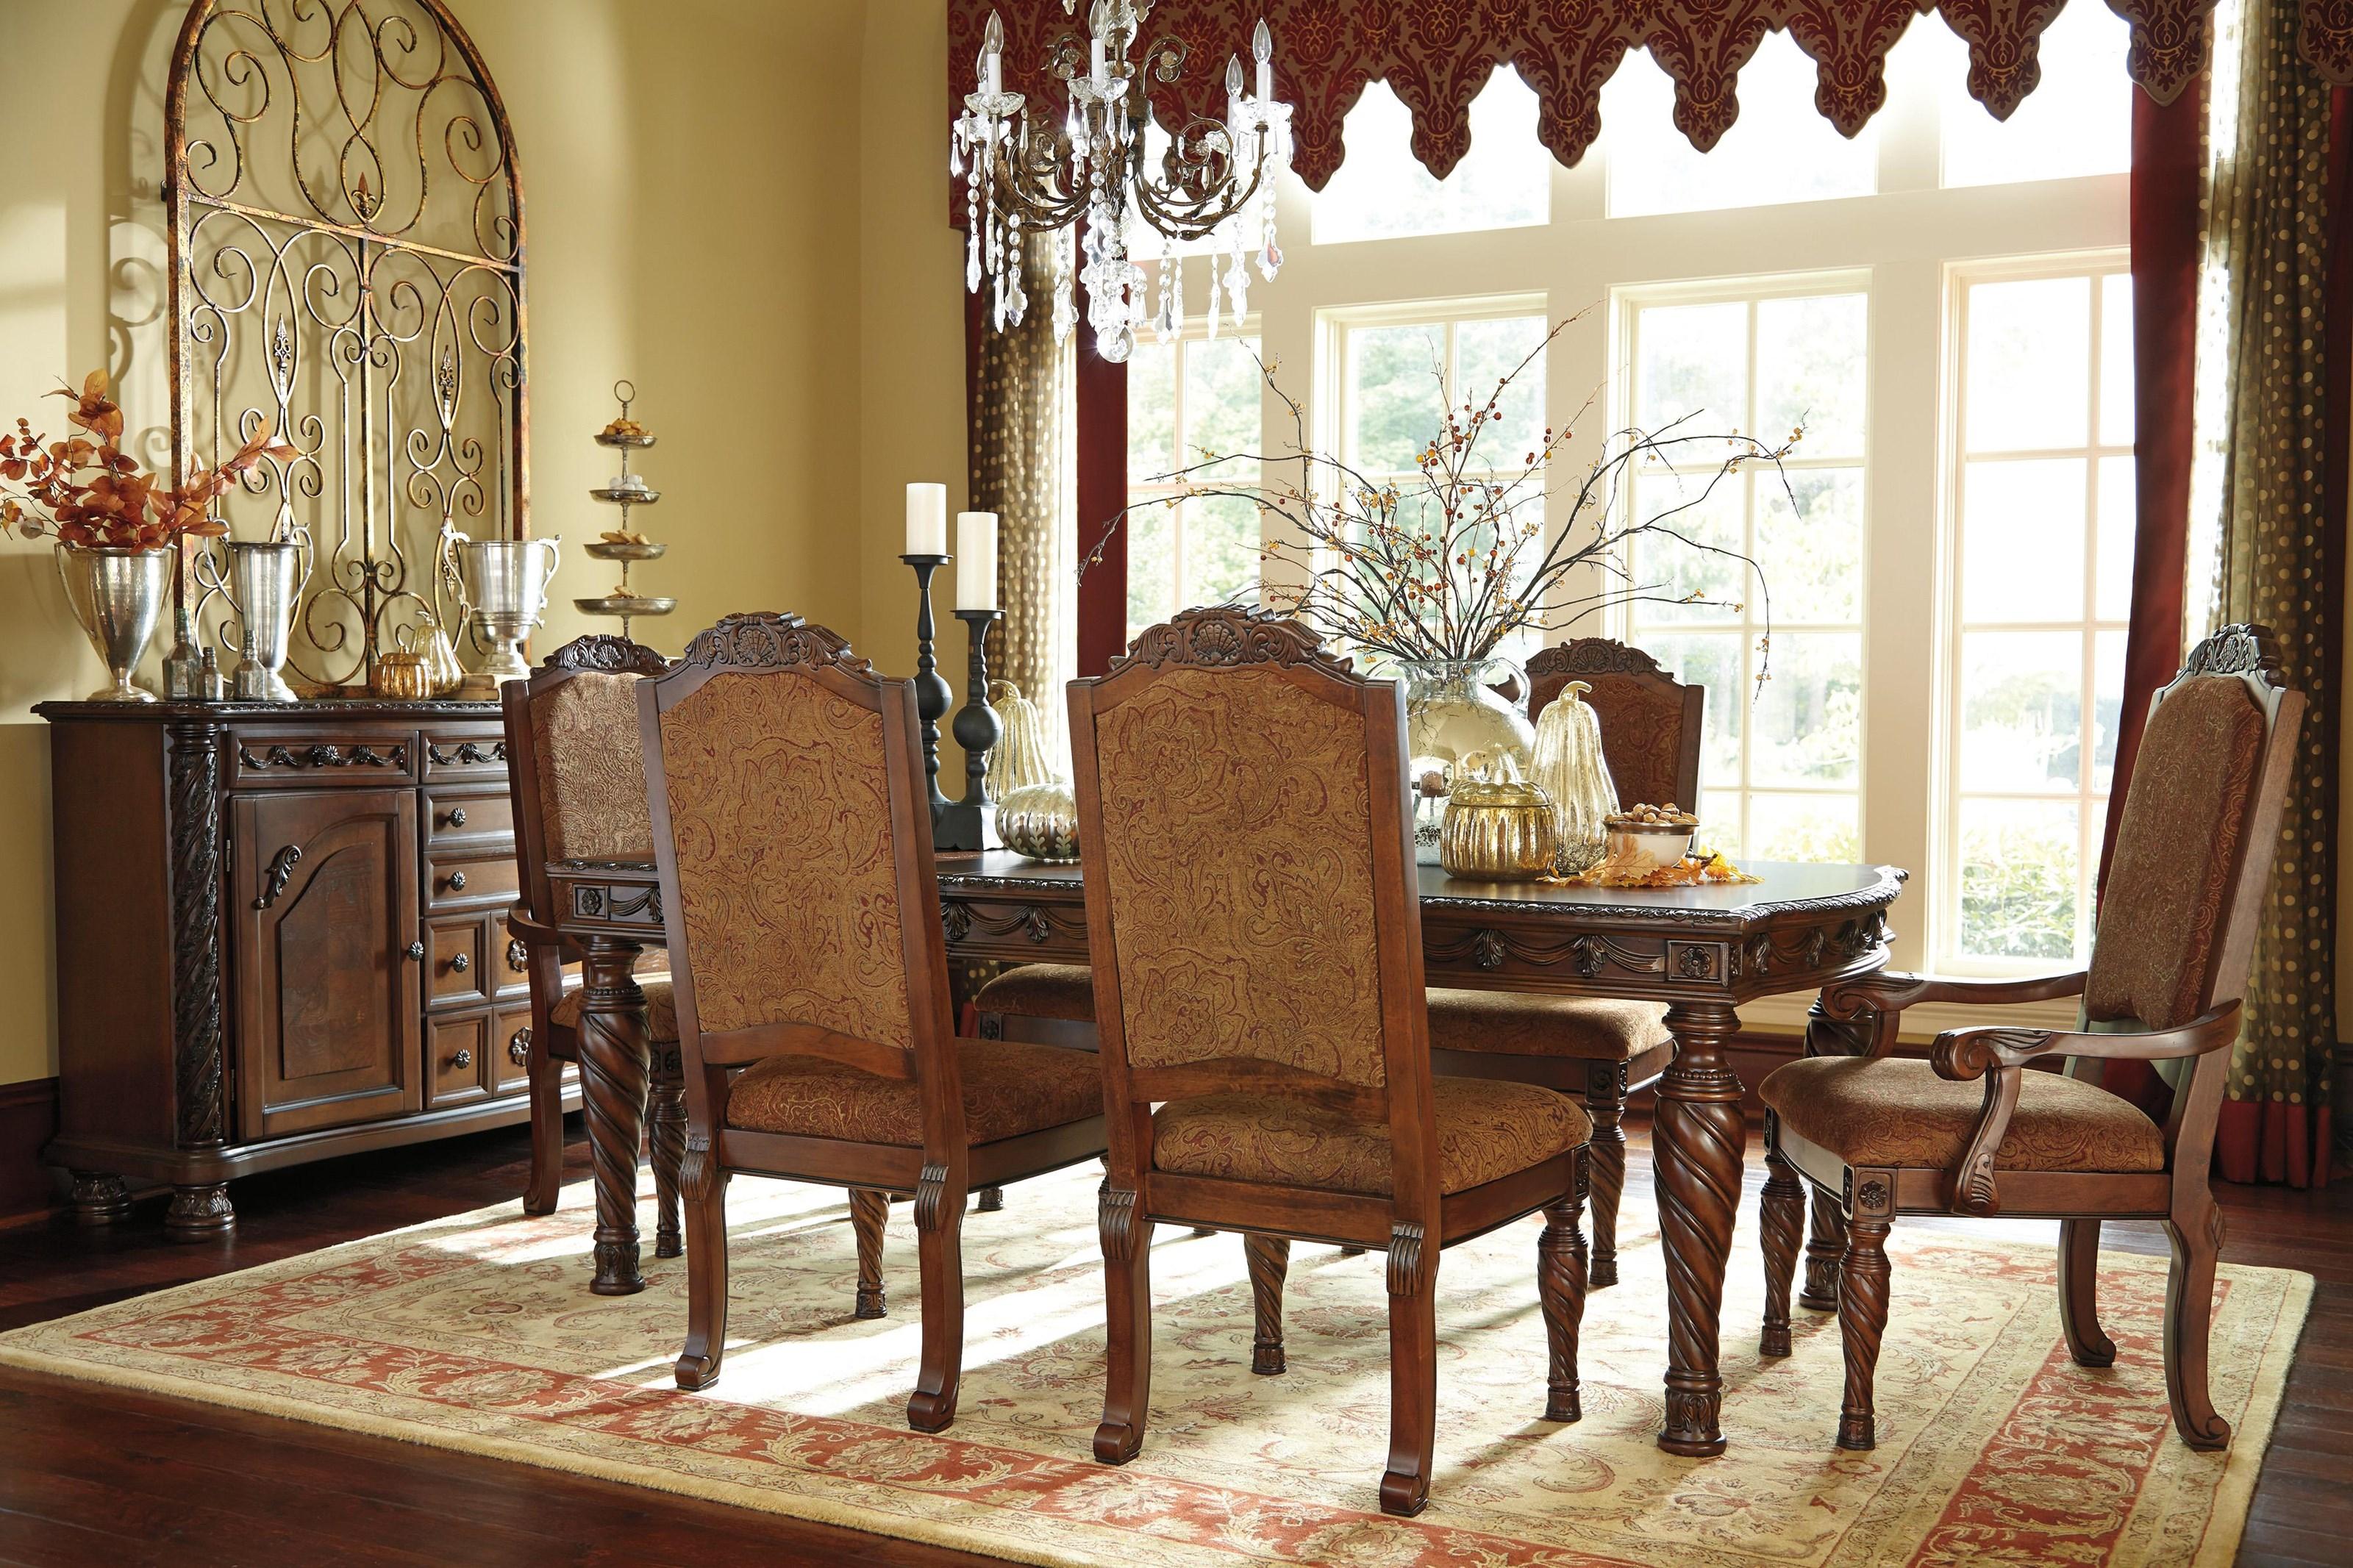 7 PC Formal Dining Set